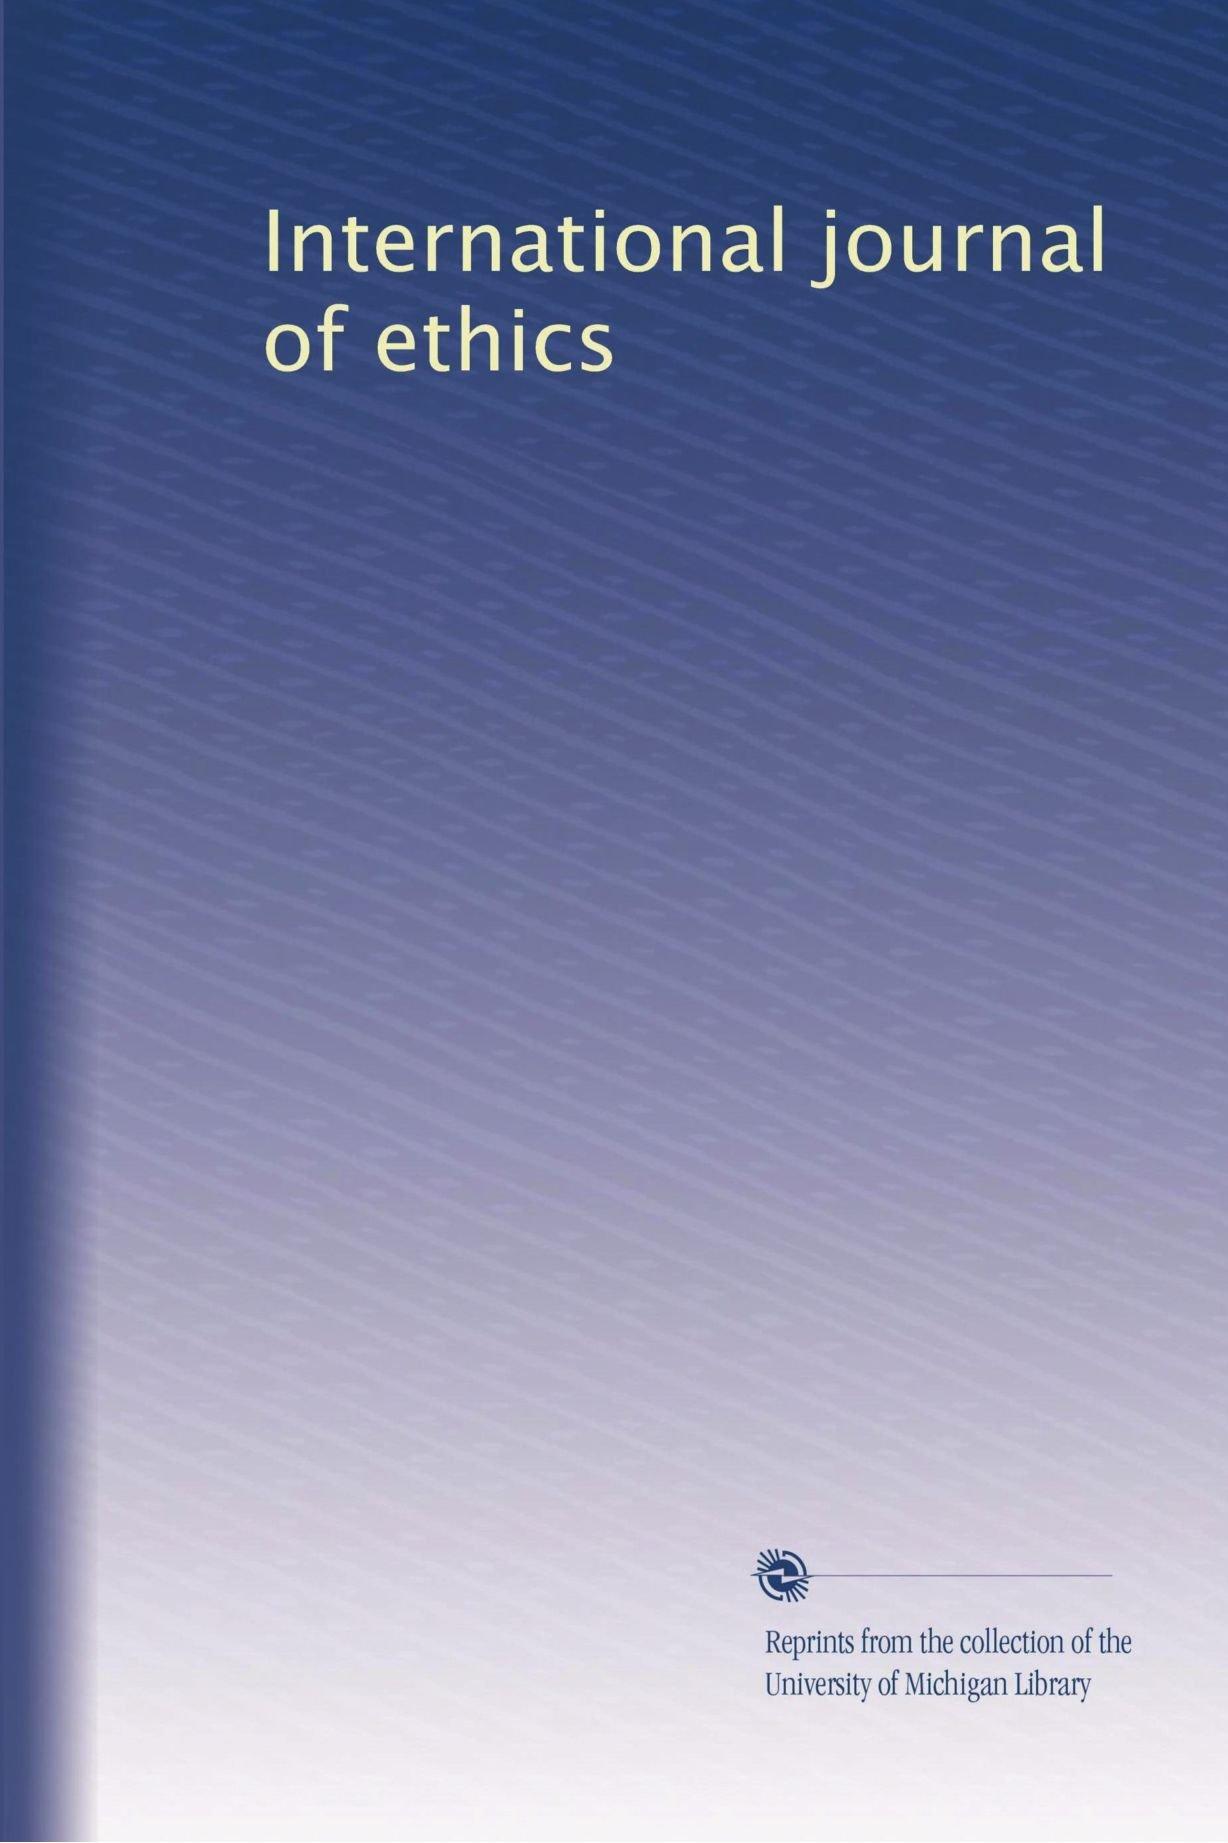 International journal of ethics ebook